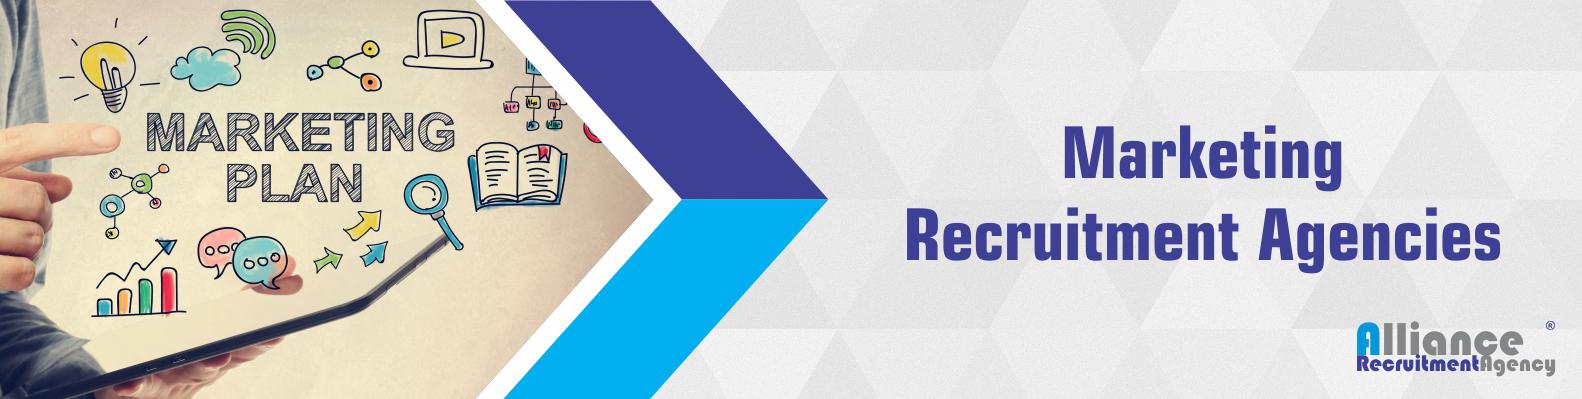 Marketing Recruitment Agencies - Top Marketing Recruitment Agencies